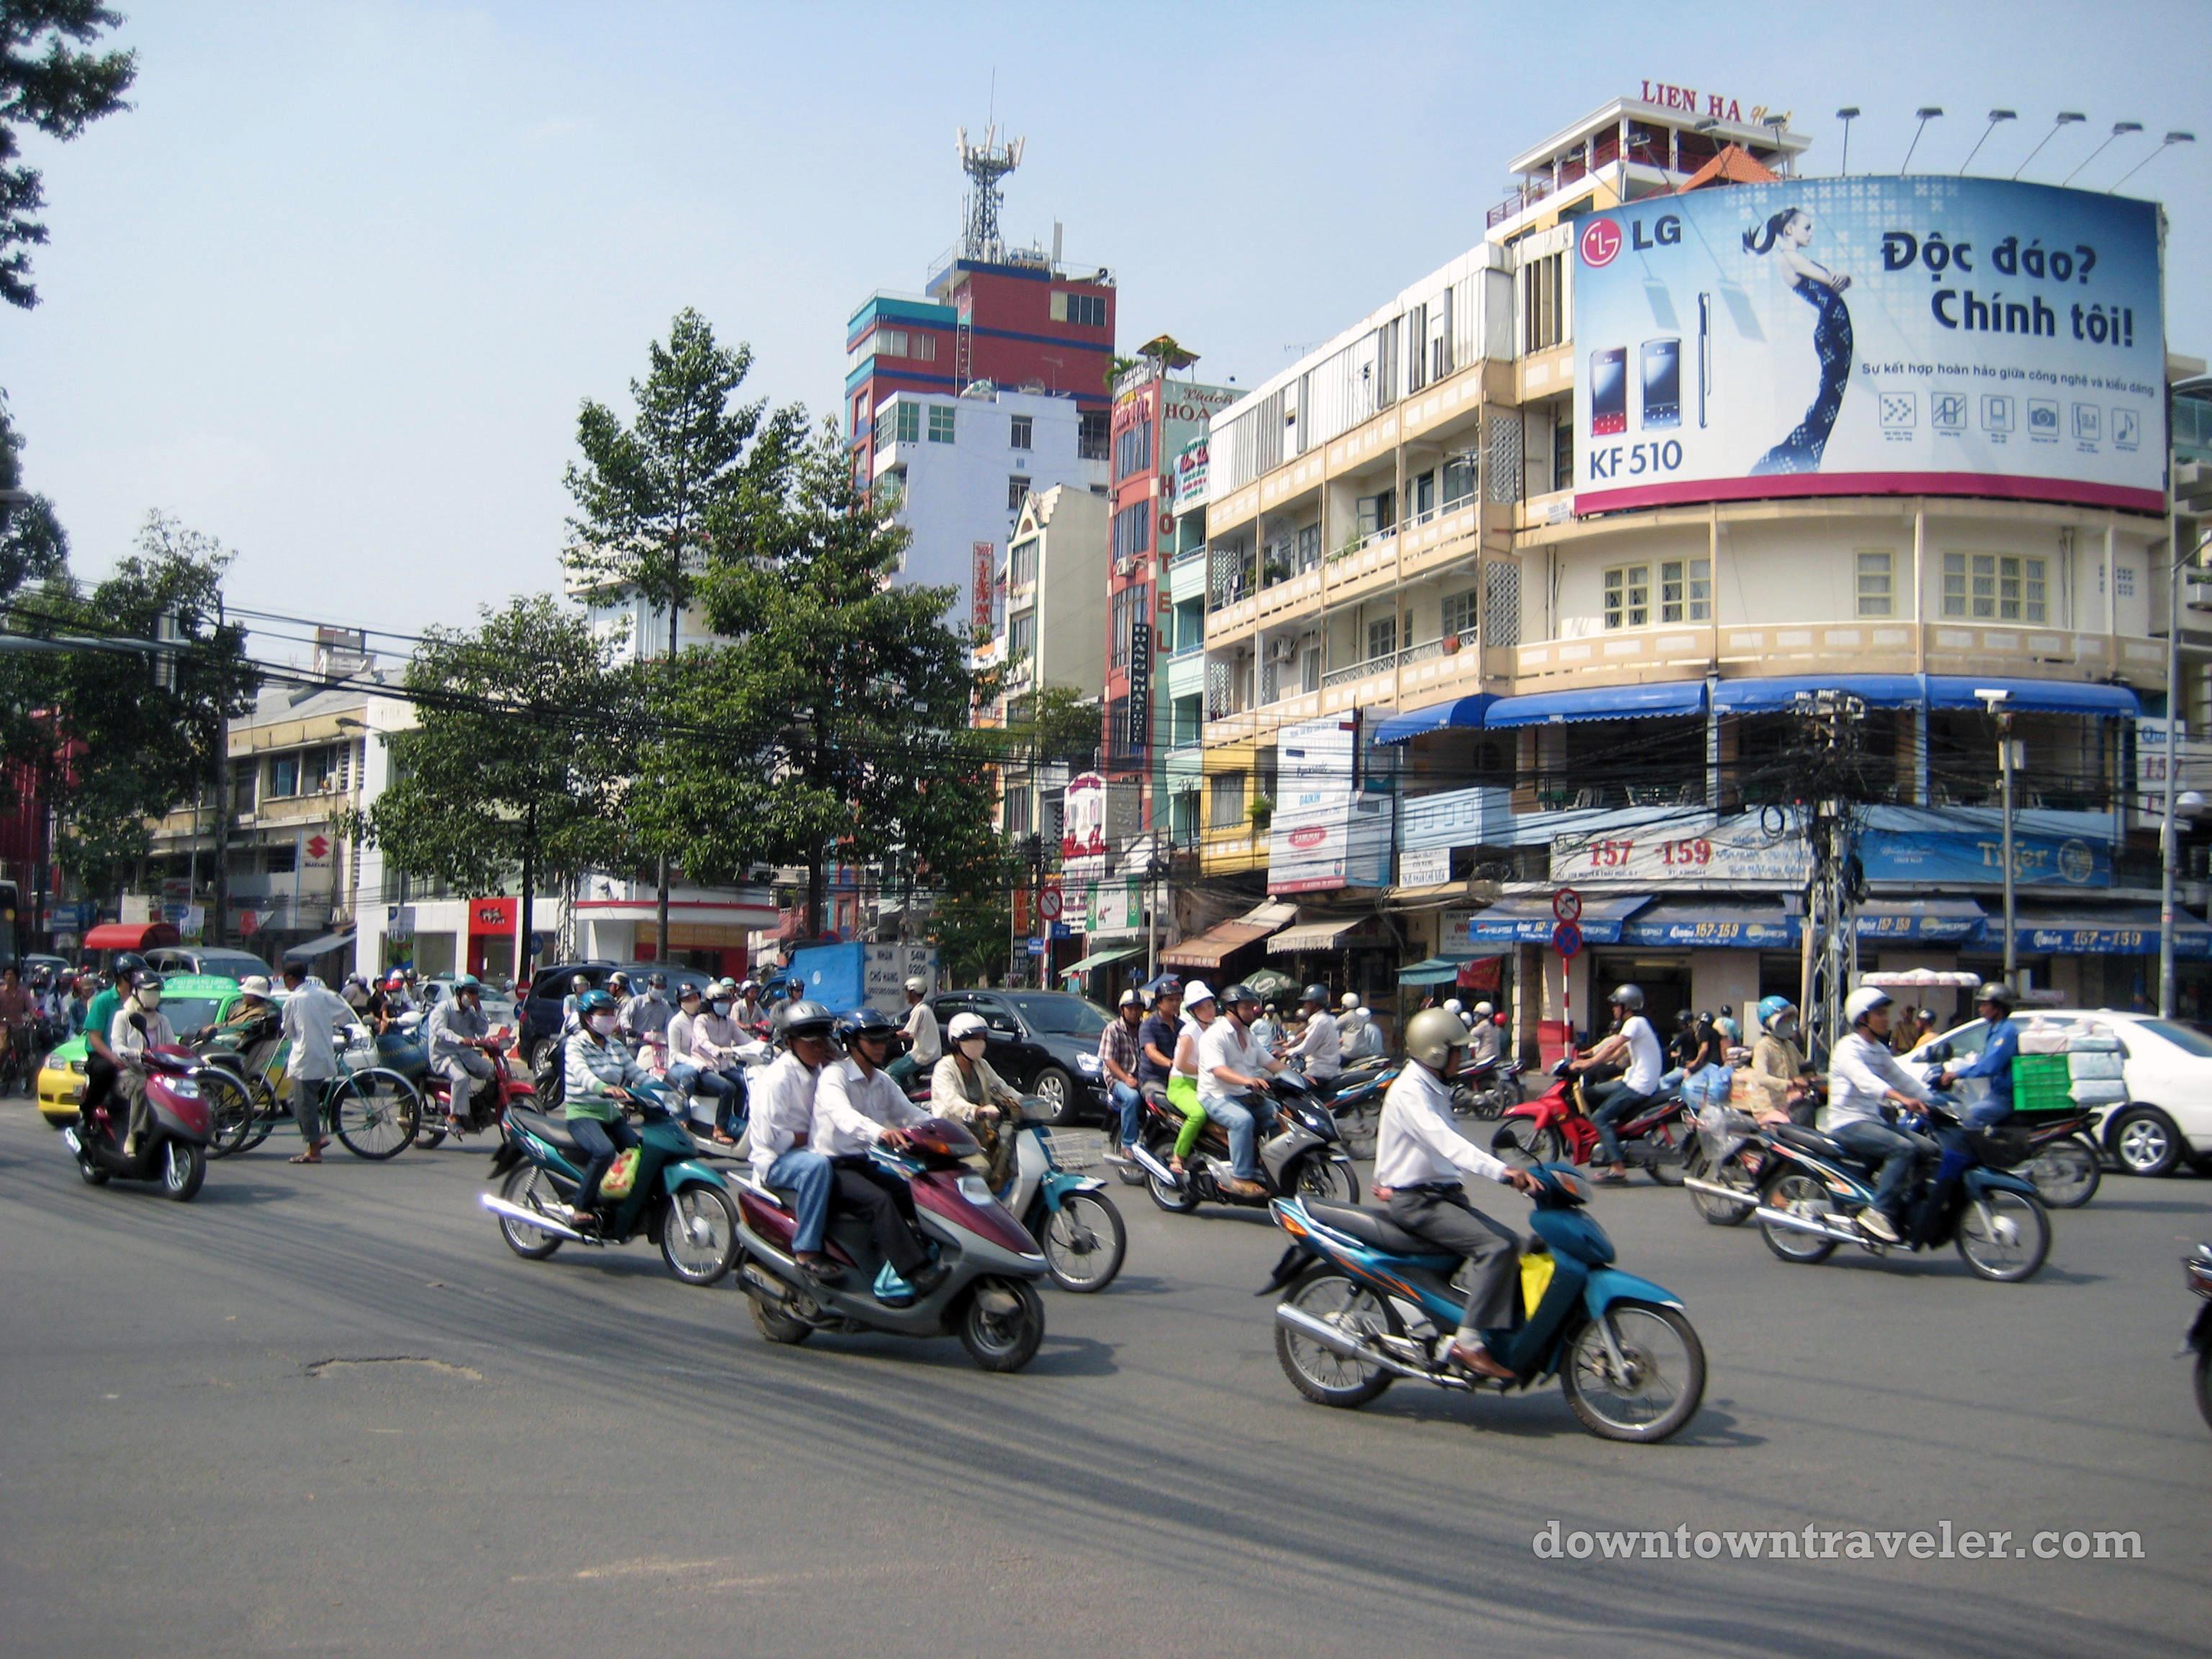 http://downtowntraveler.com/wp-content/uploads/2011/04/saigon-street-scene.jpg